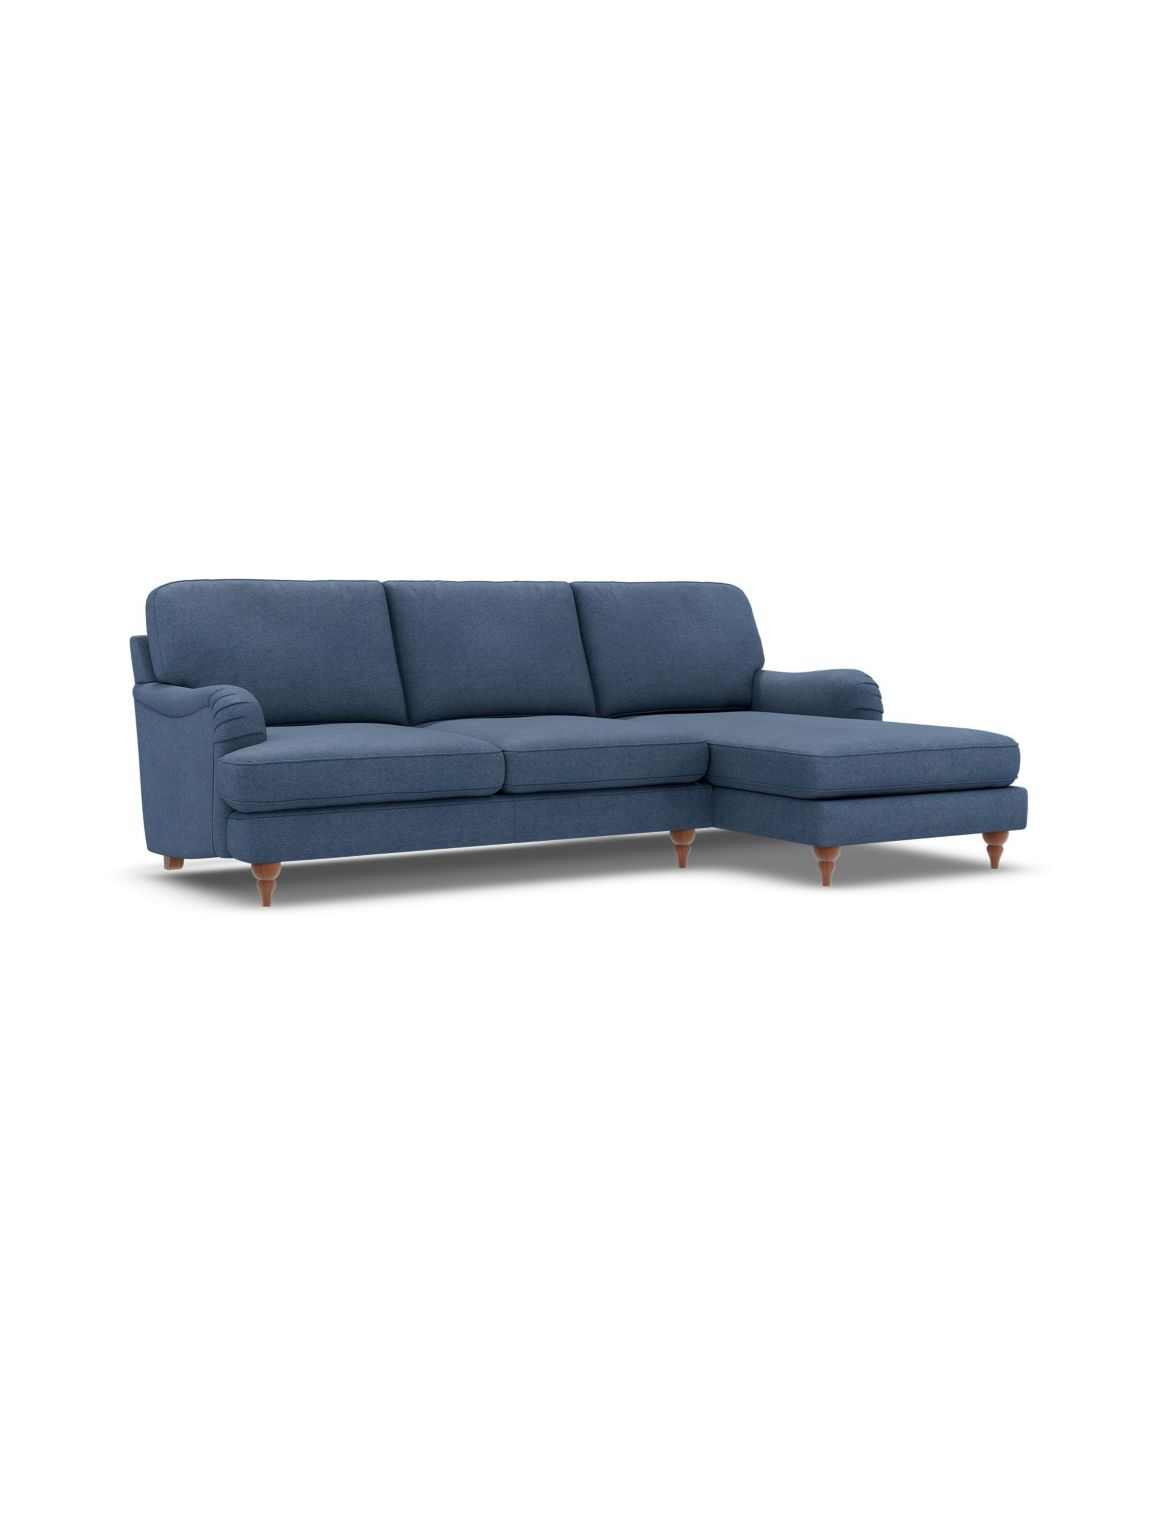 Rochester Corner Chaise Sofa (Right-Hand) Navy